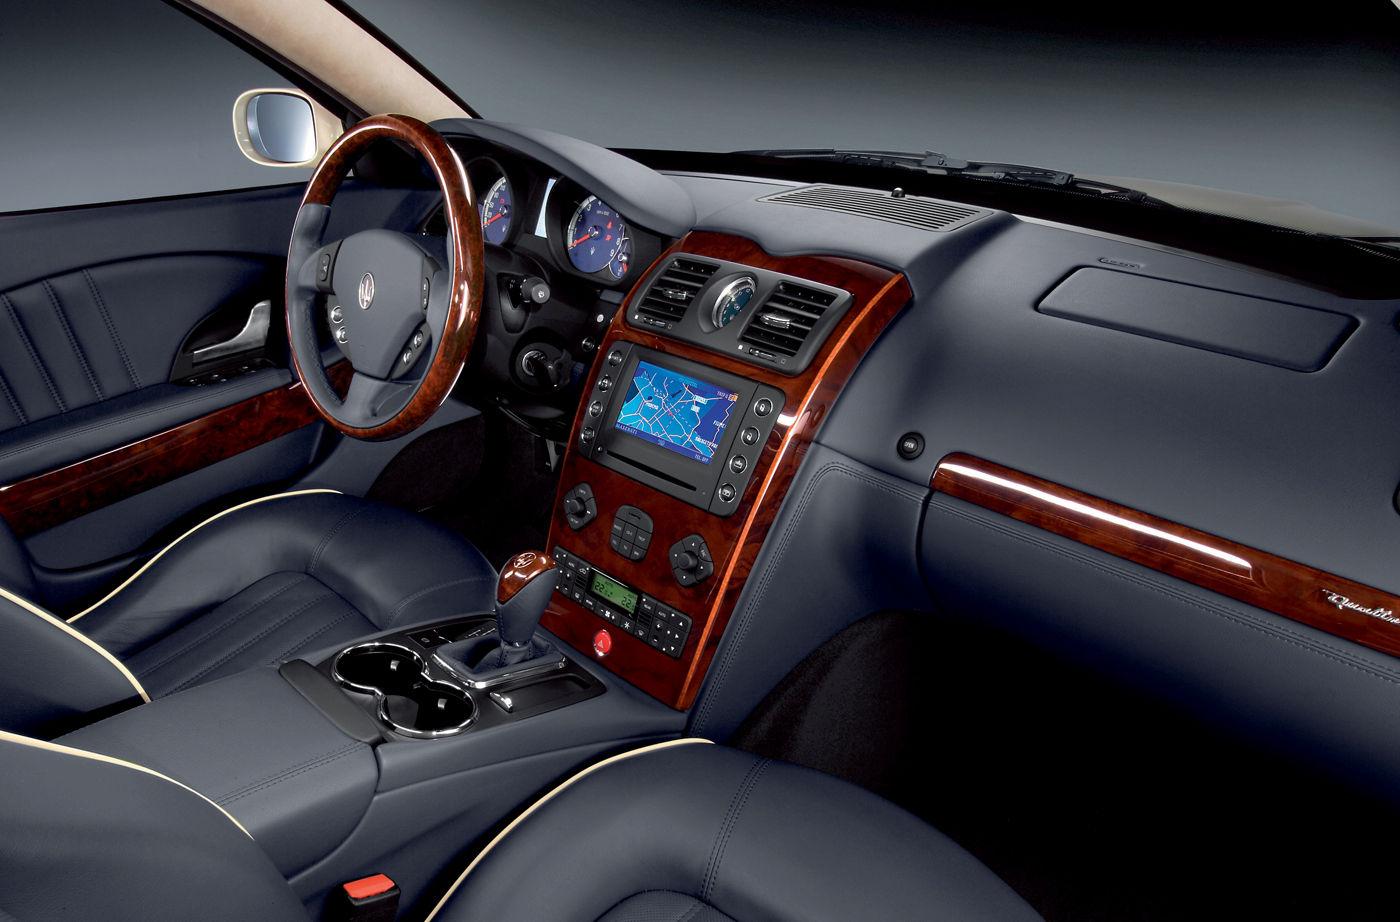 2006 Maserati Quattroporte V Automatica - interior details of the Pininfarina-designed sedan